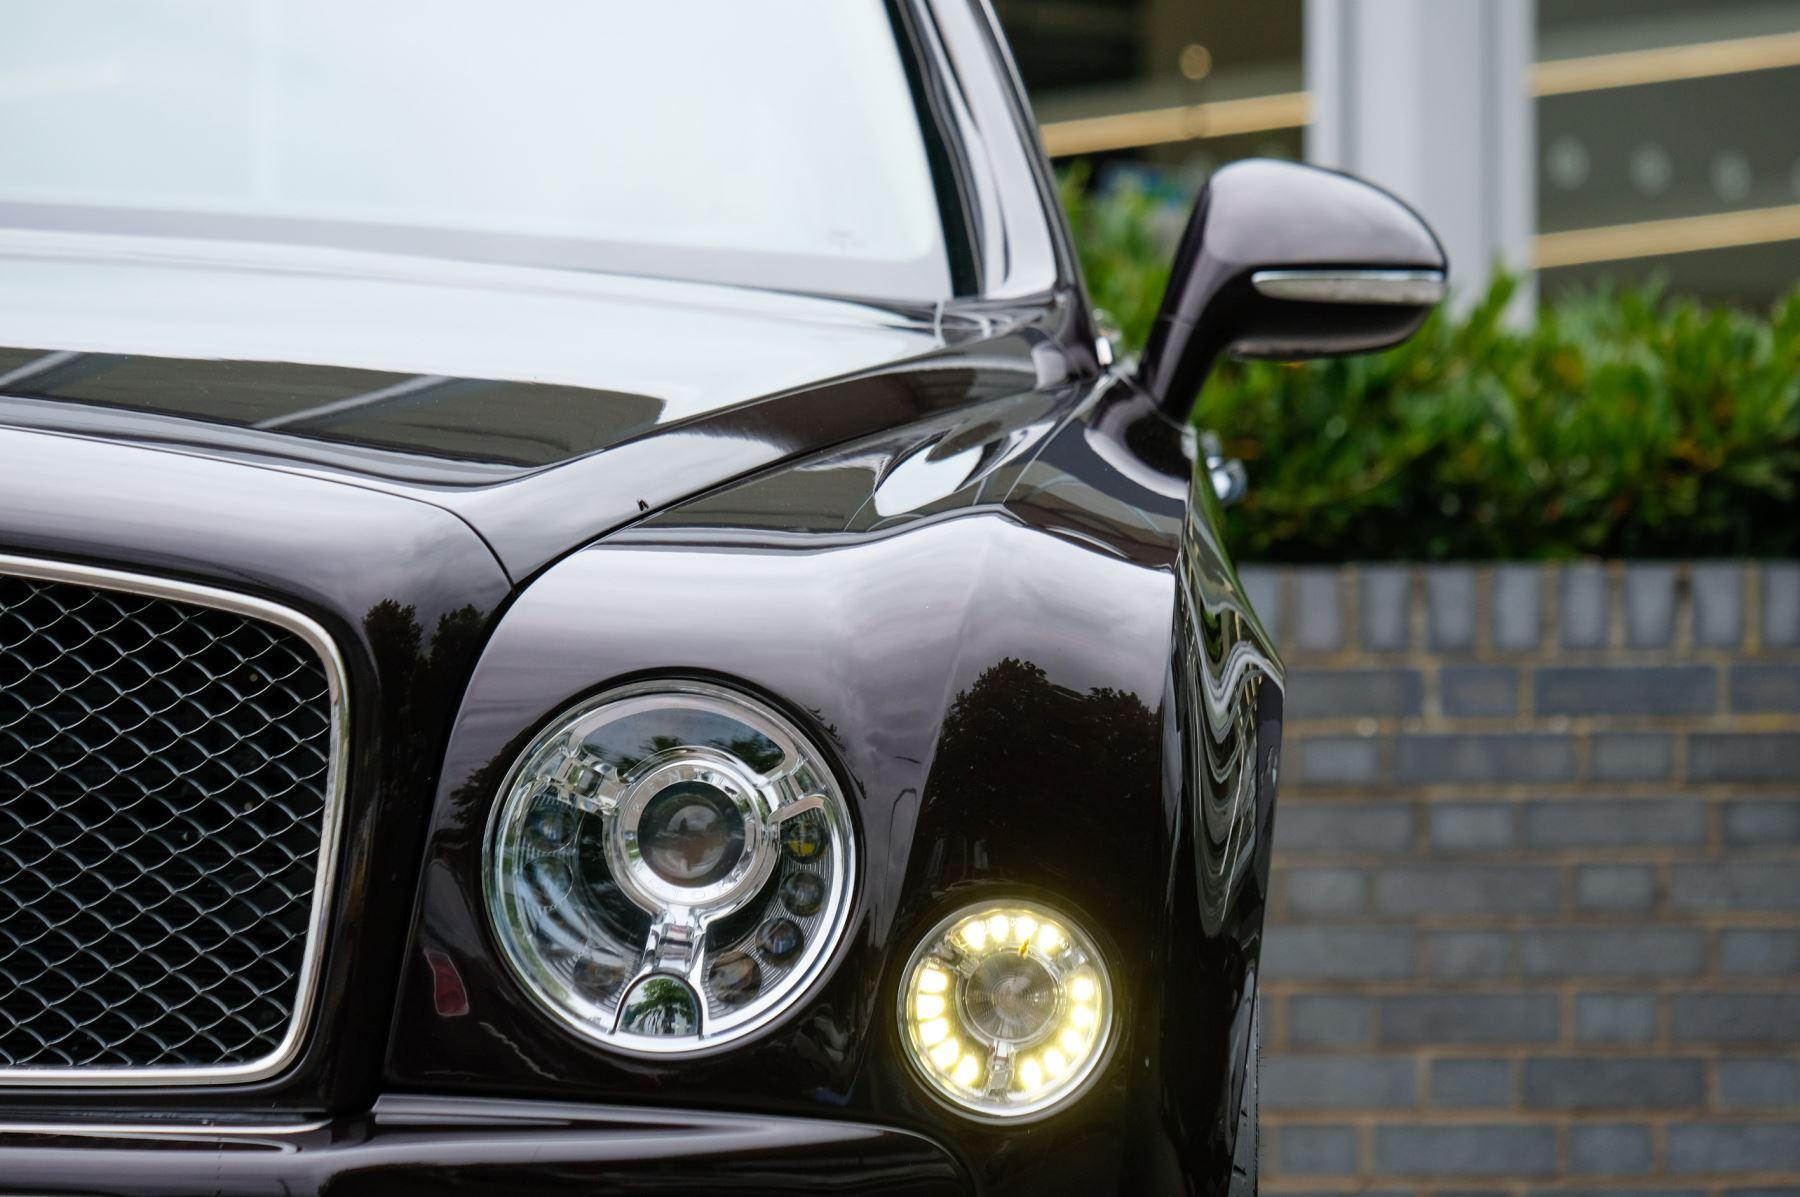 Bentley Mulsanne 6.8 V8 Speed - Speed Premier Specification image 6